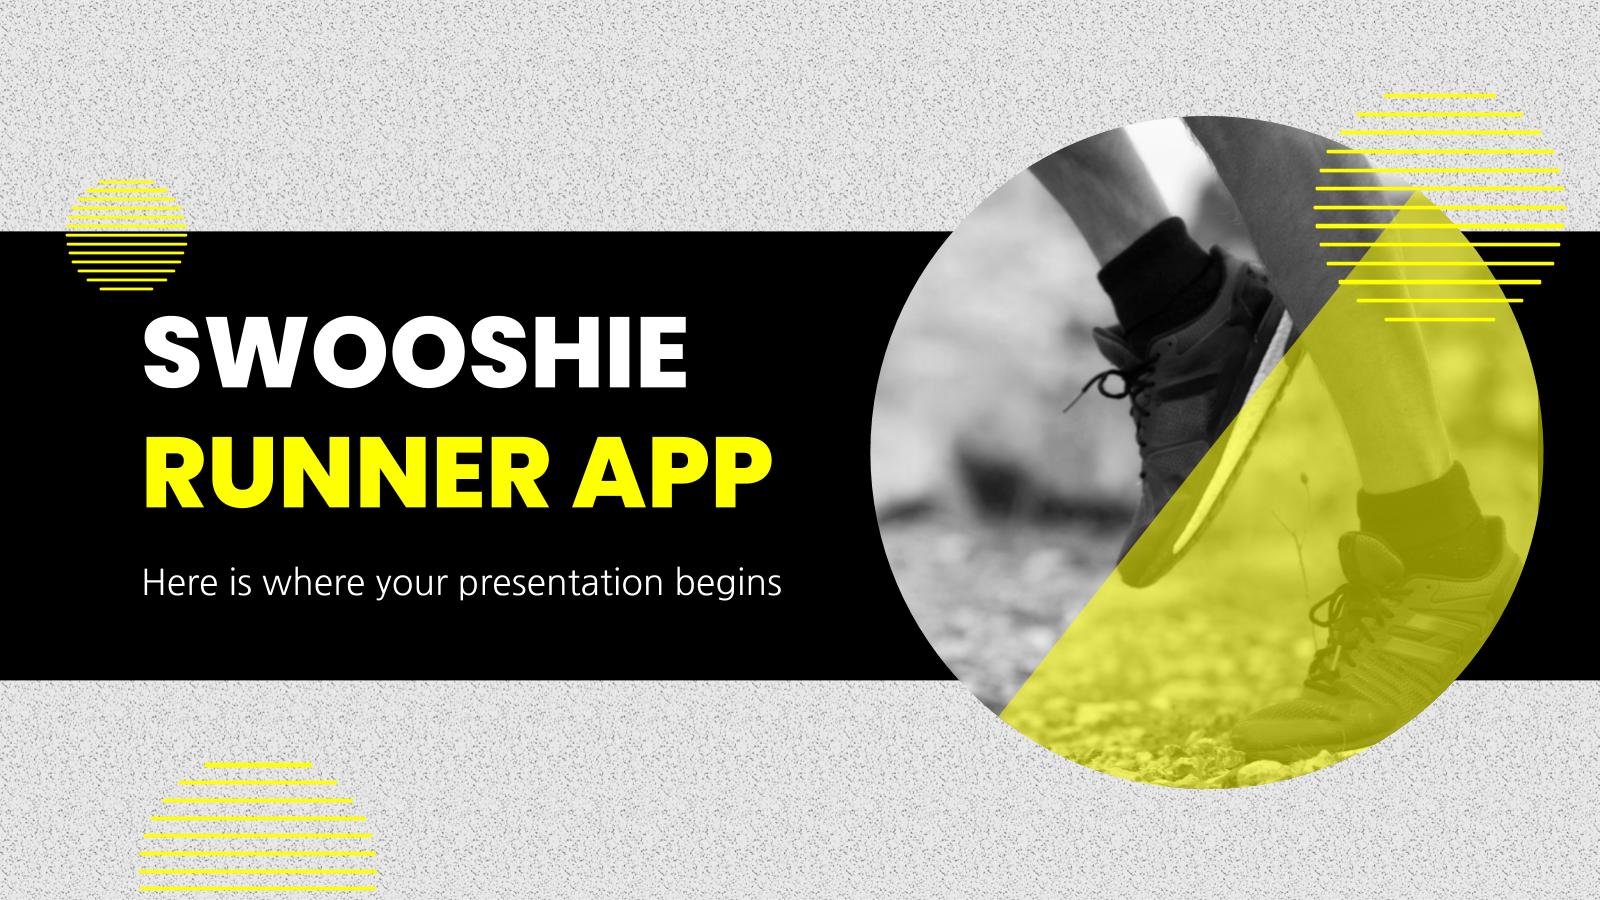 Swooshie Runner App presentation template